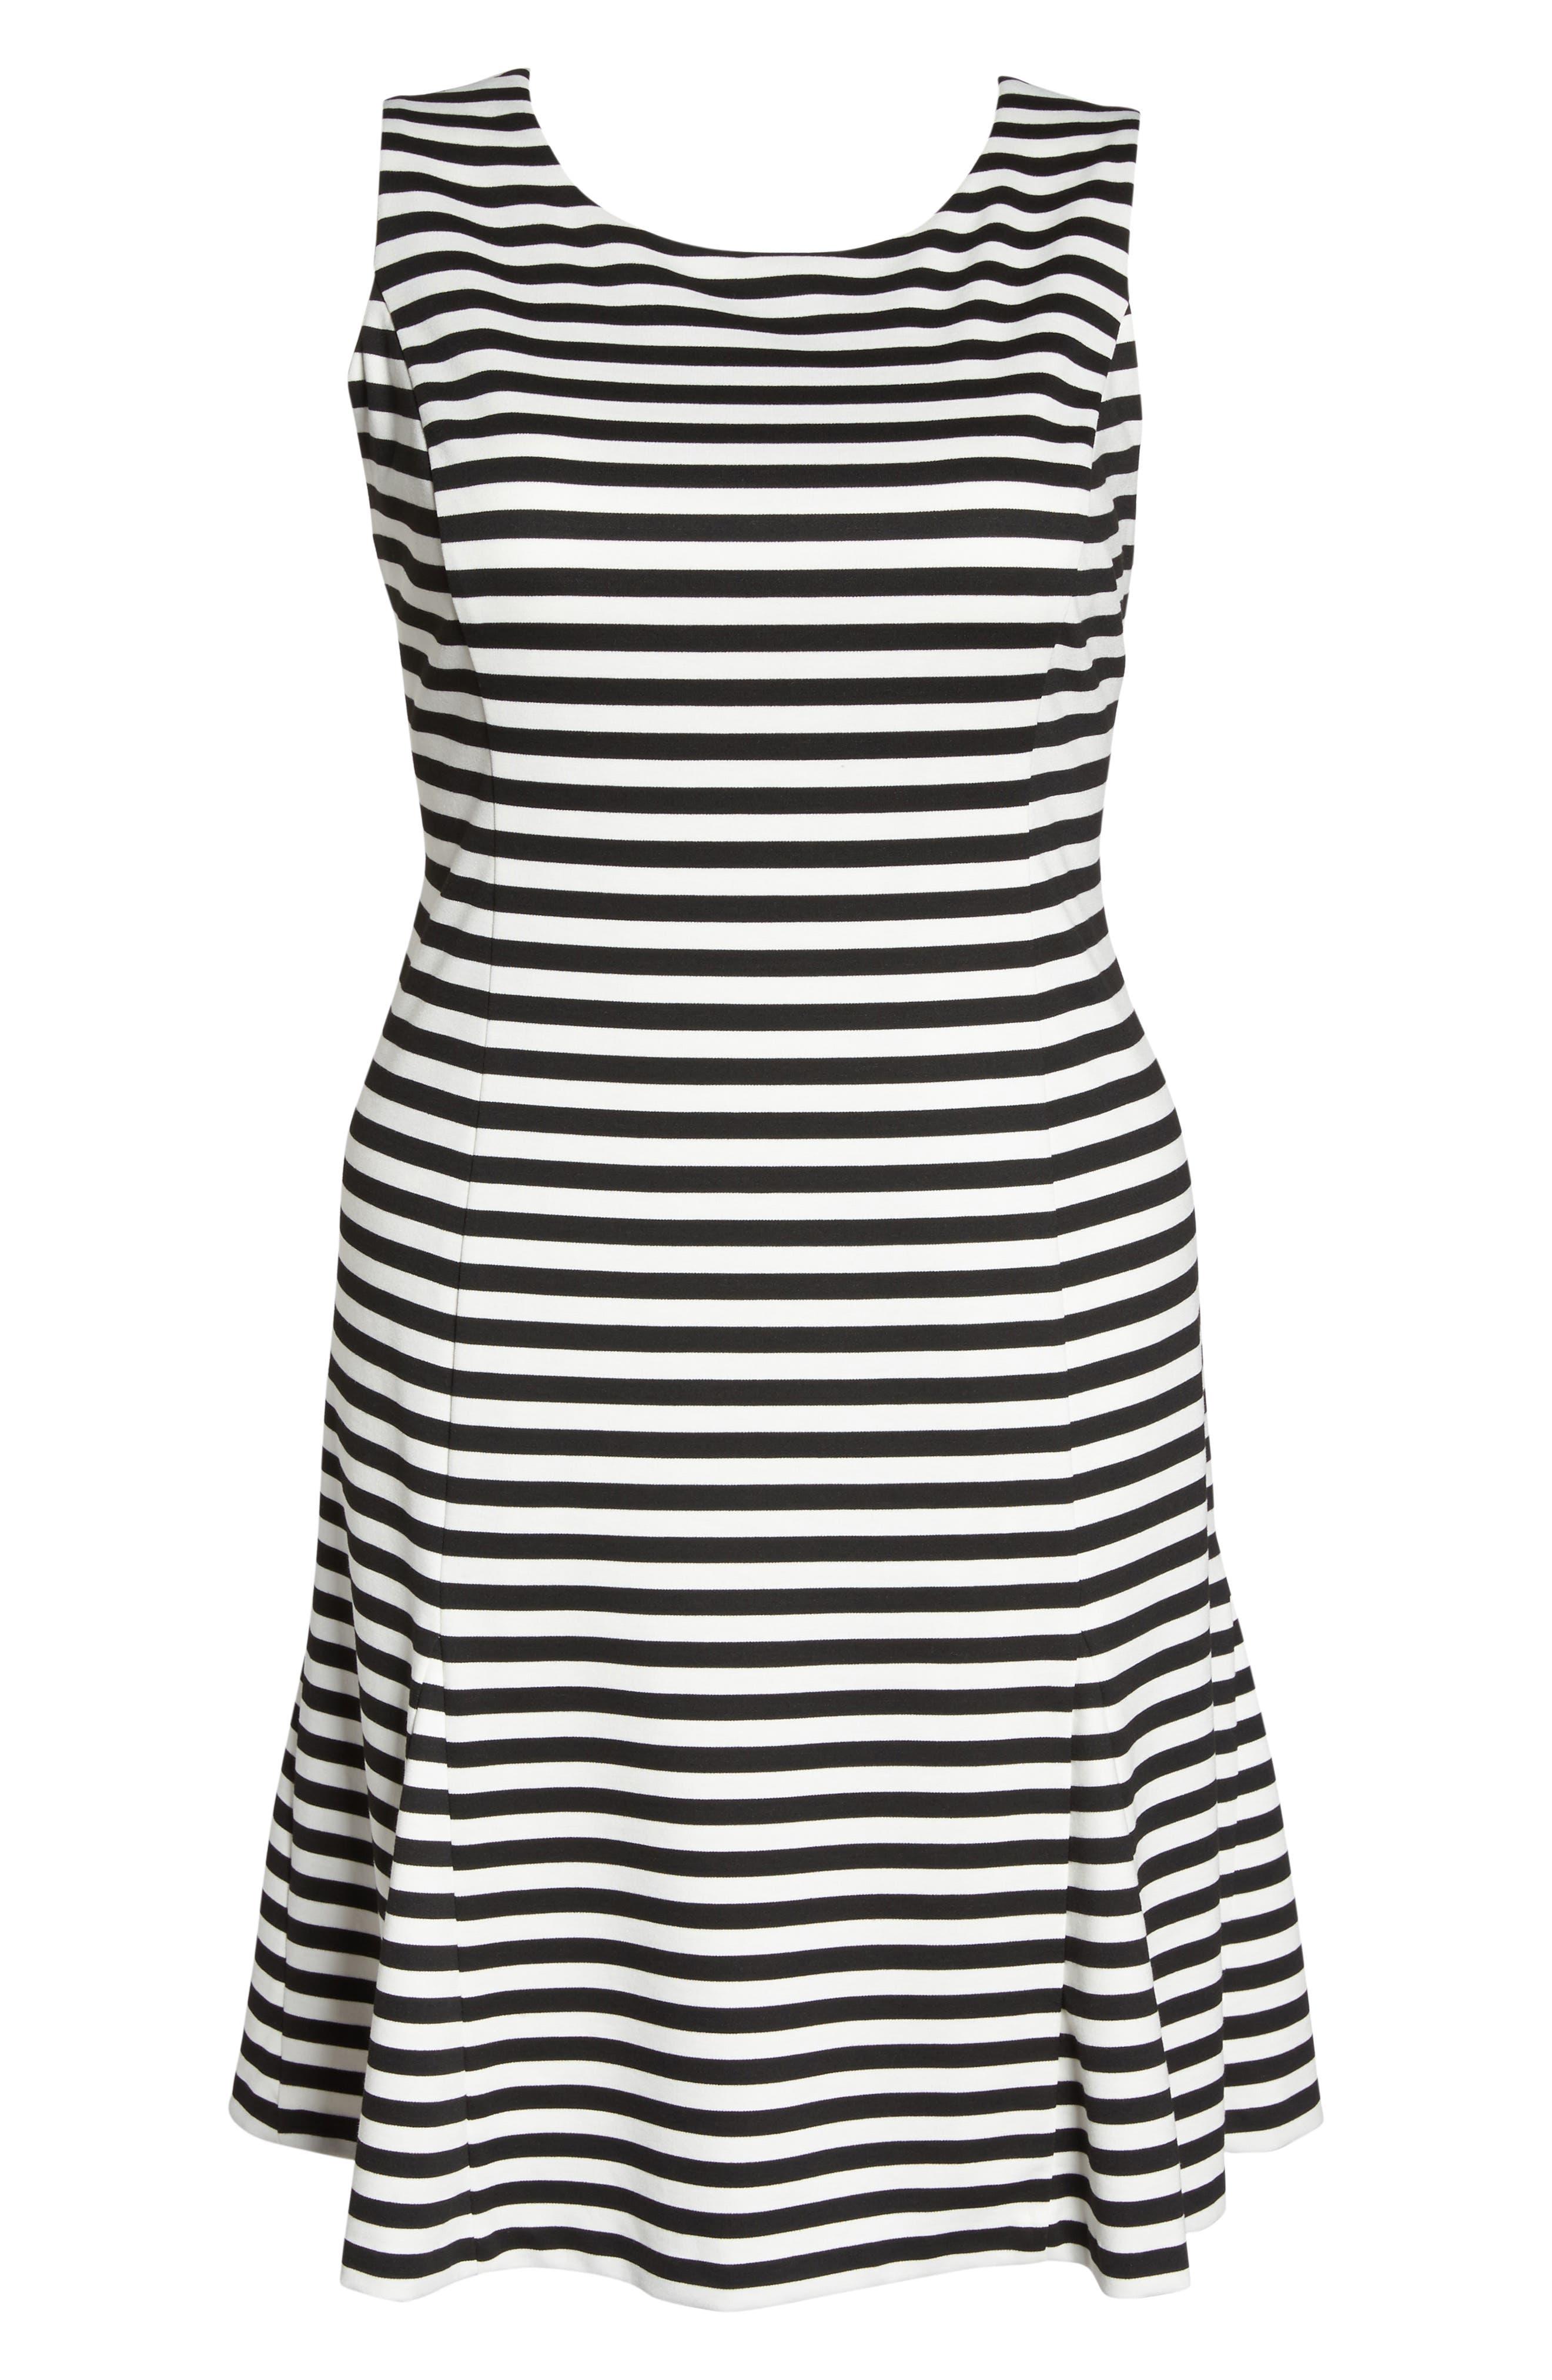 Godet Body-Con Dress,                             Alternate thumbnail 6, color,                             Black/ Ivory